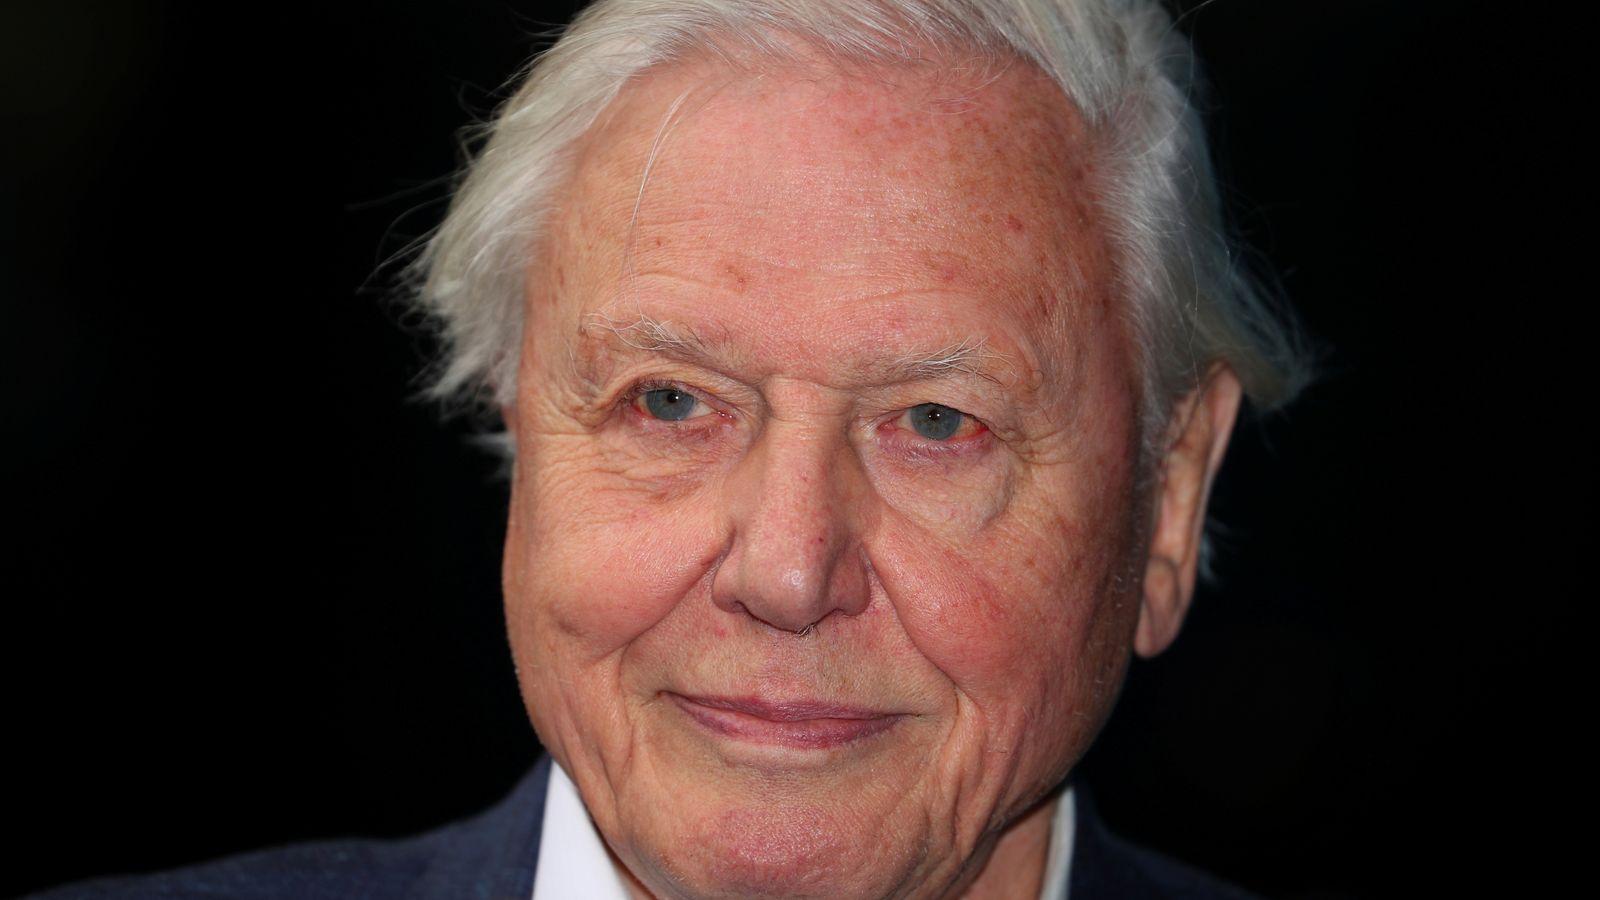 David Attenborough becomes latest celeb to get COVID-19 vaccine